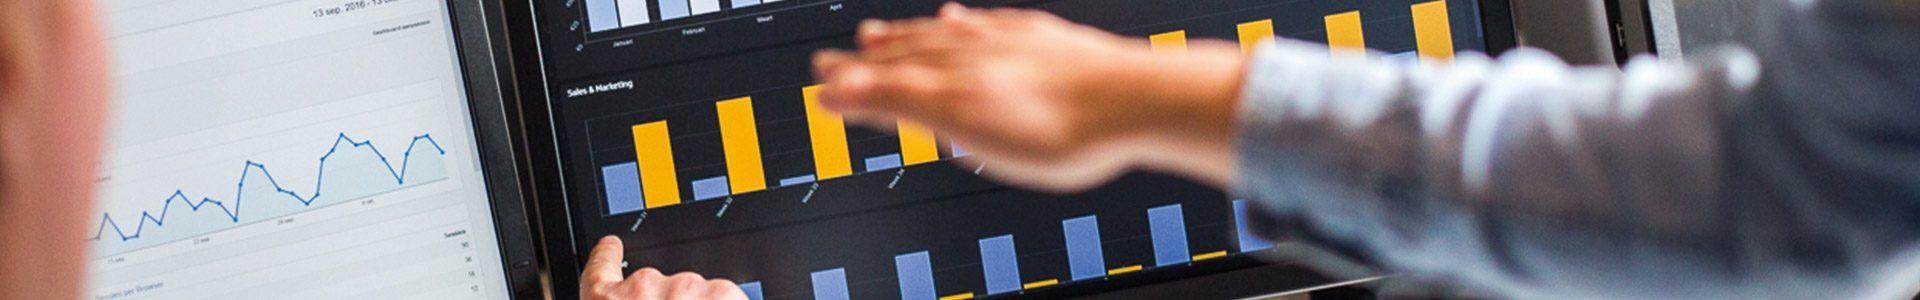 8 tips om je seo resultaten aan je leidinggevende te rapporteren